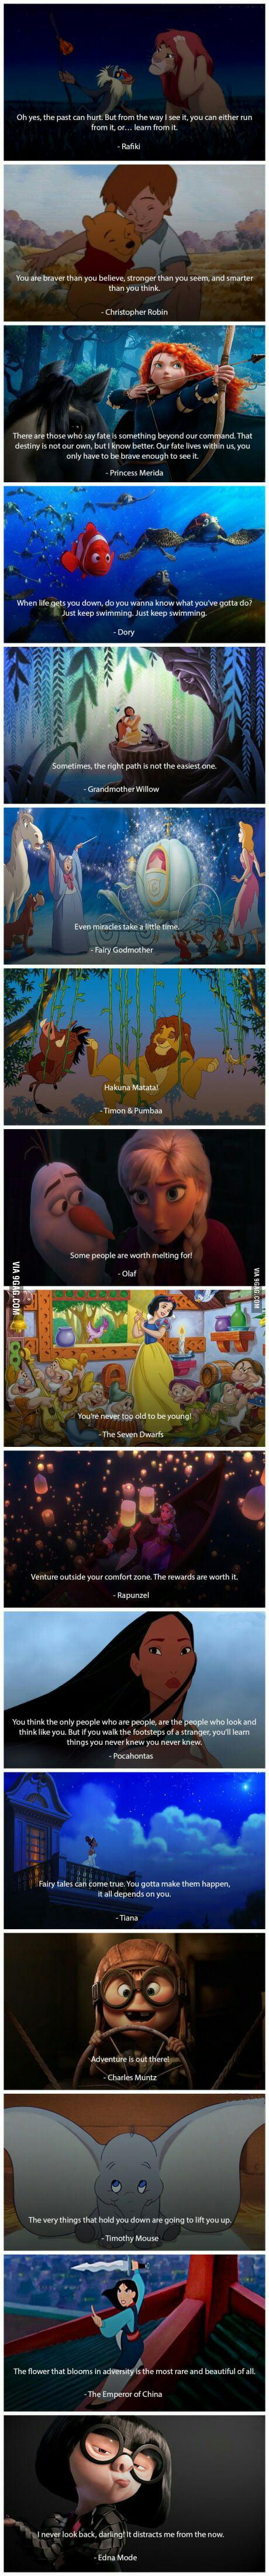 Disney Quotes 9gag